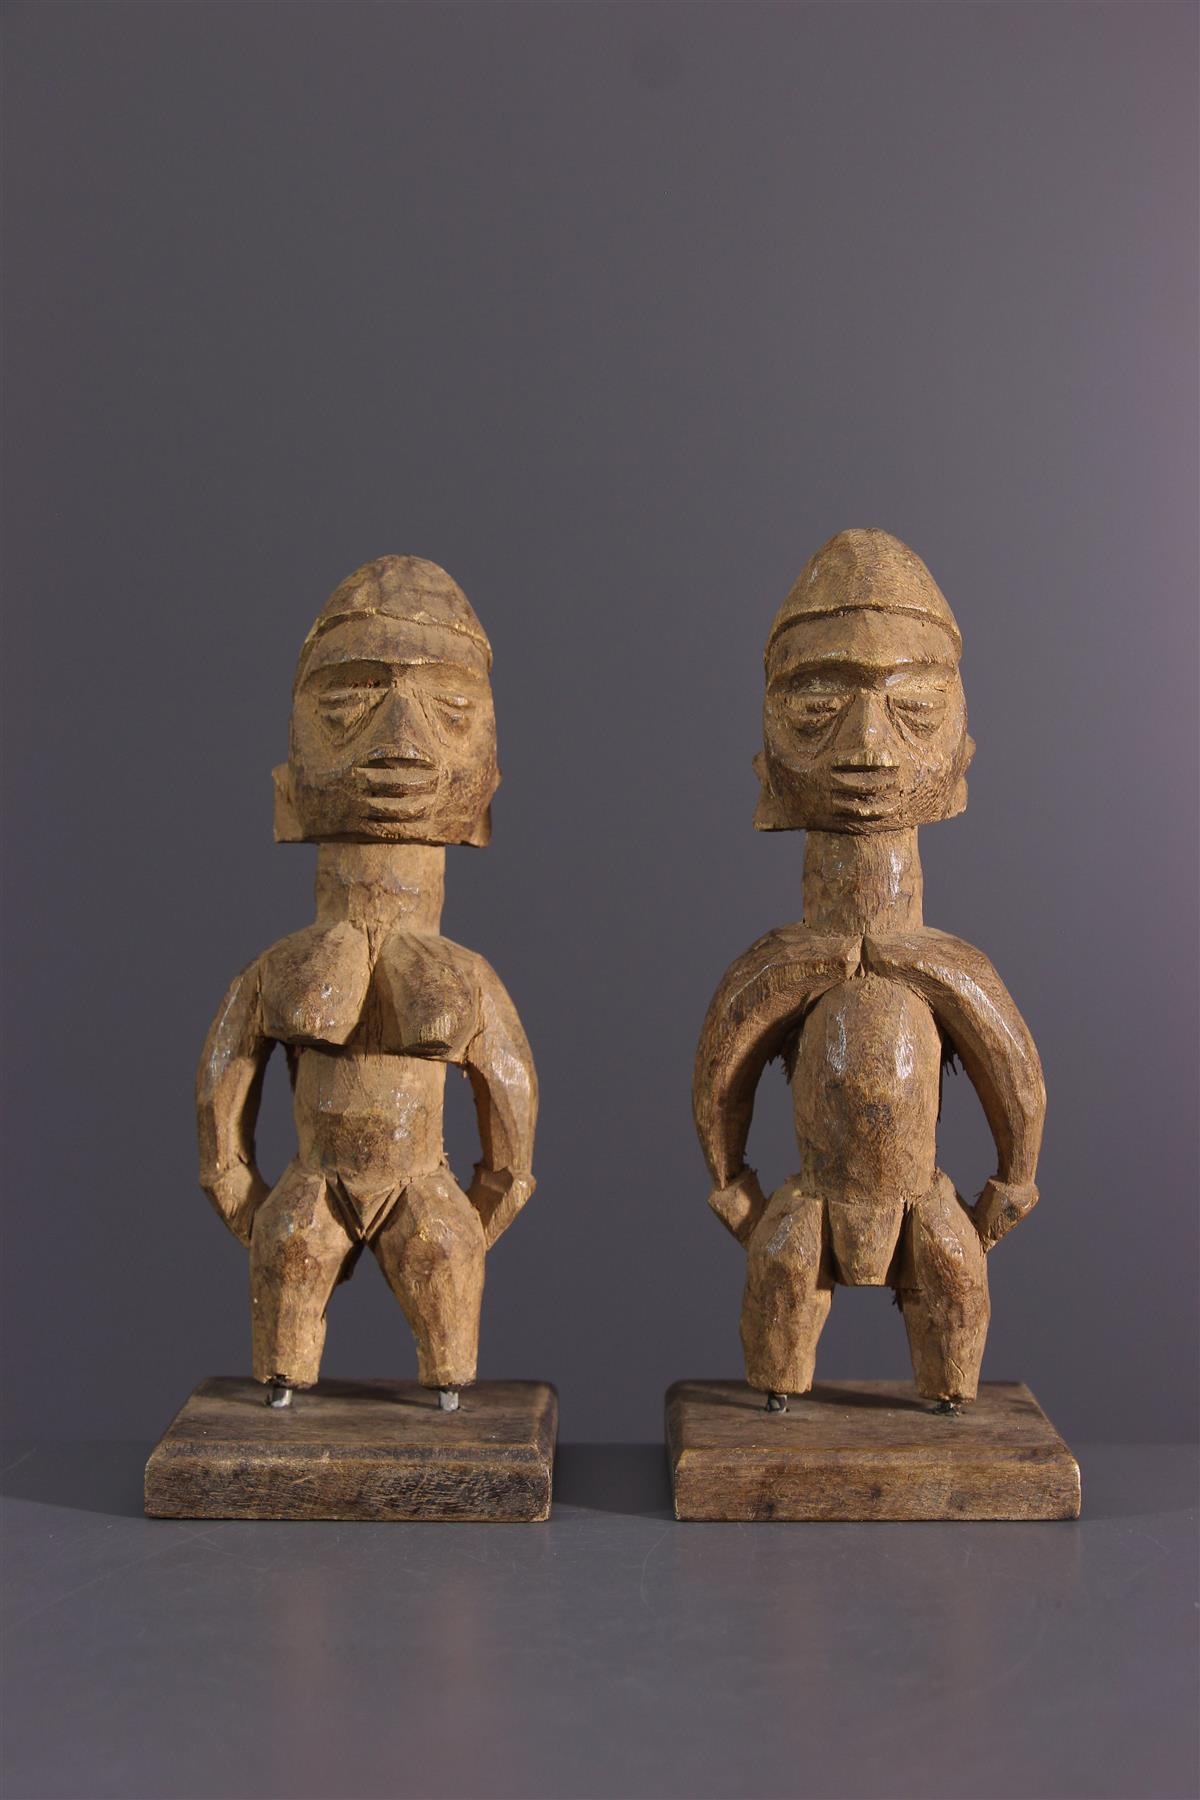 Ewe beeldje - Afrikaanse kunst